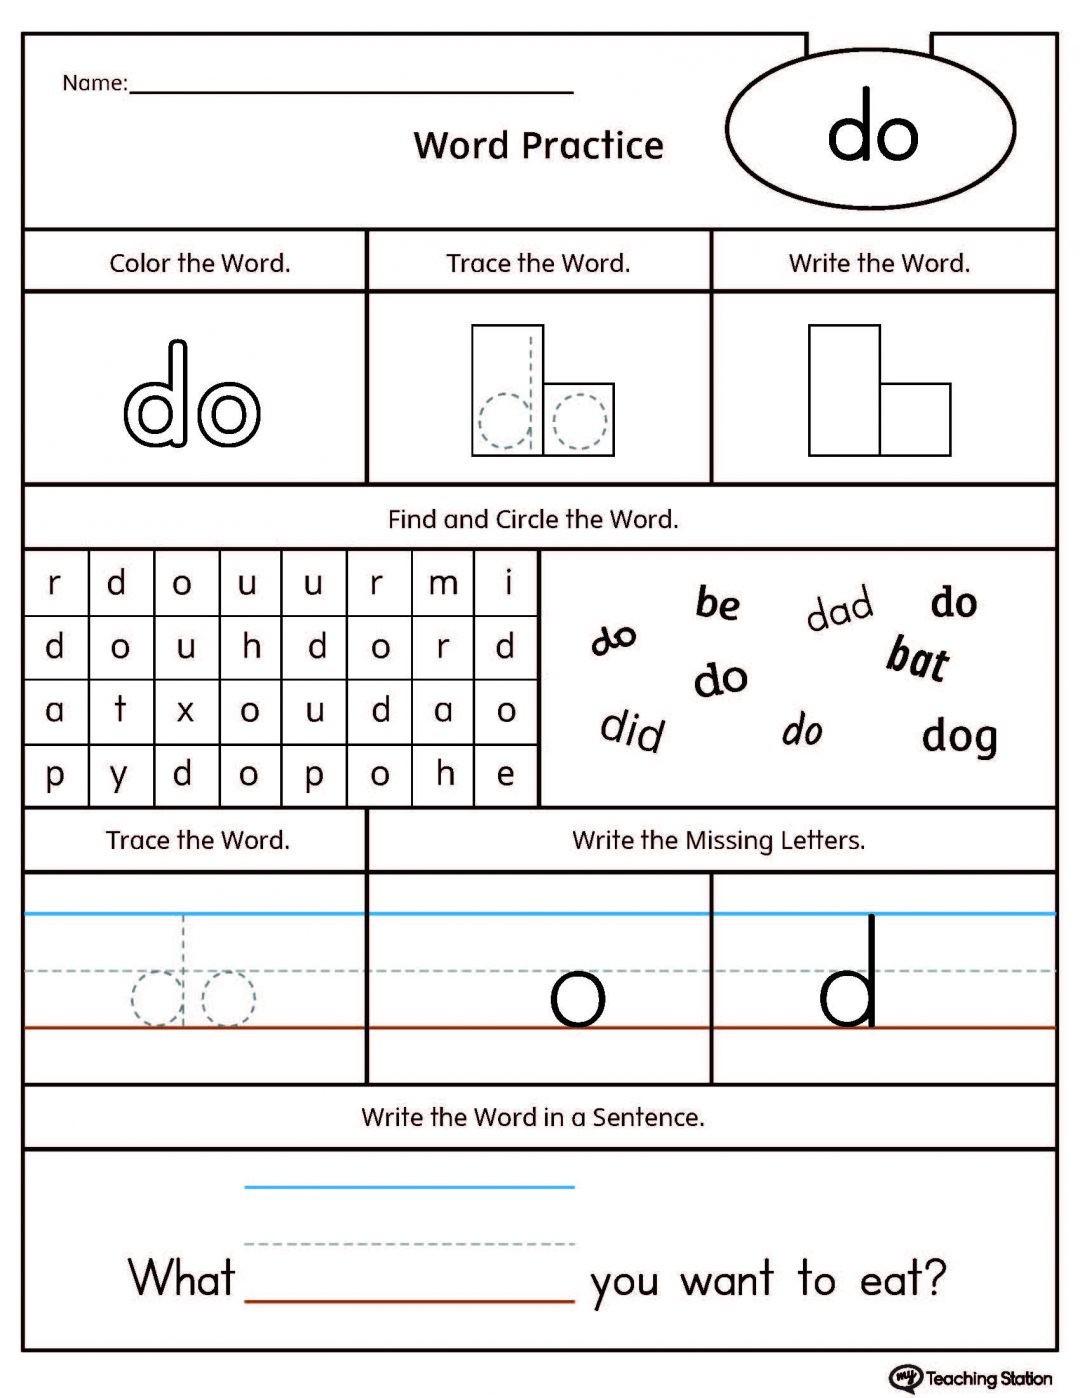 Worksheet : Missing Letters Worksheets Fresh Free Math Kindergarten - Free Printable Name Tracing Worksheets For Preschoolers